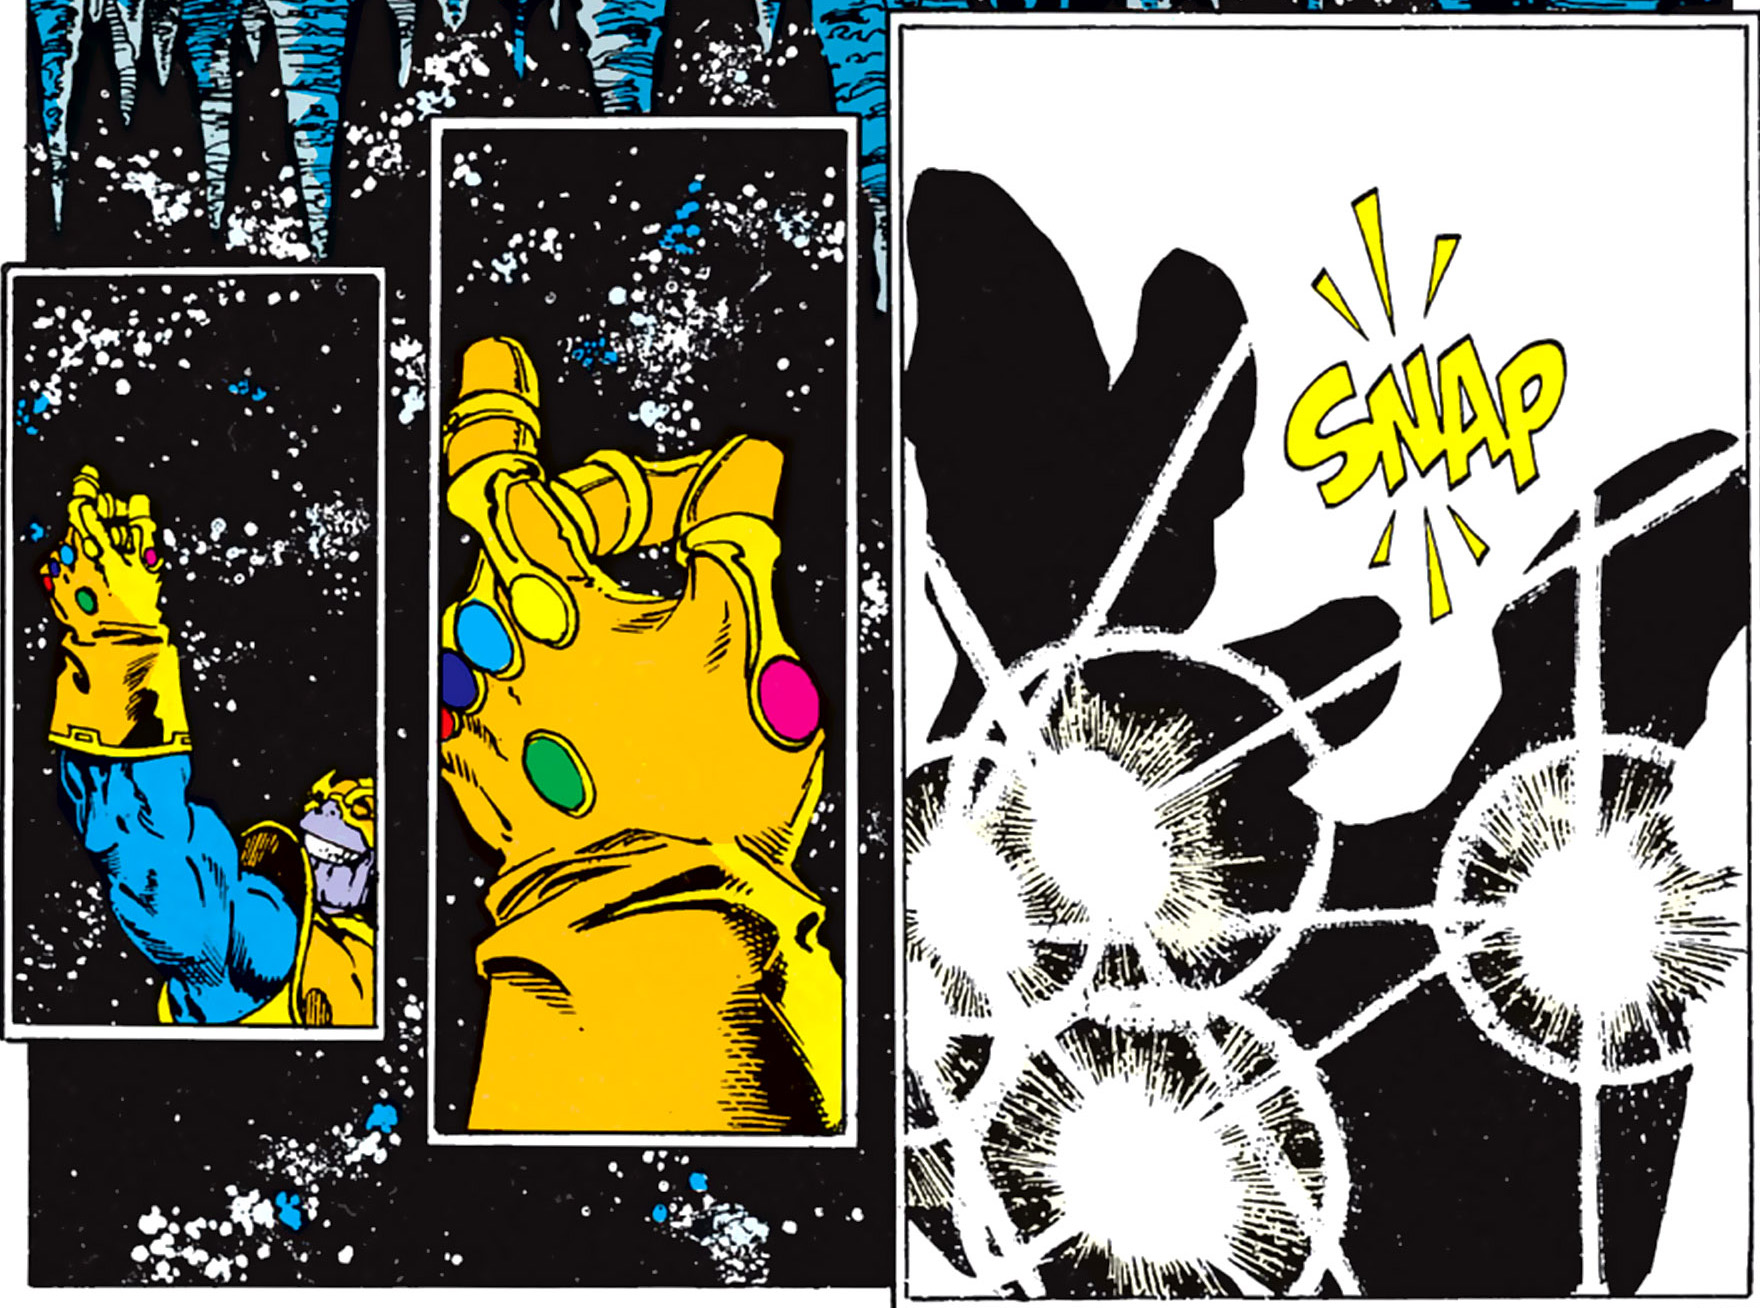 Thanos-Snap.jpg